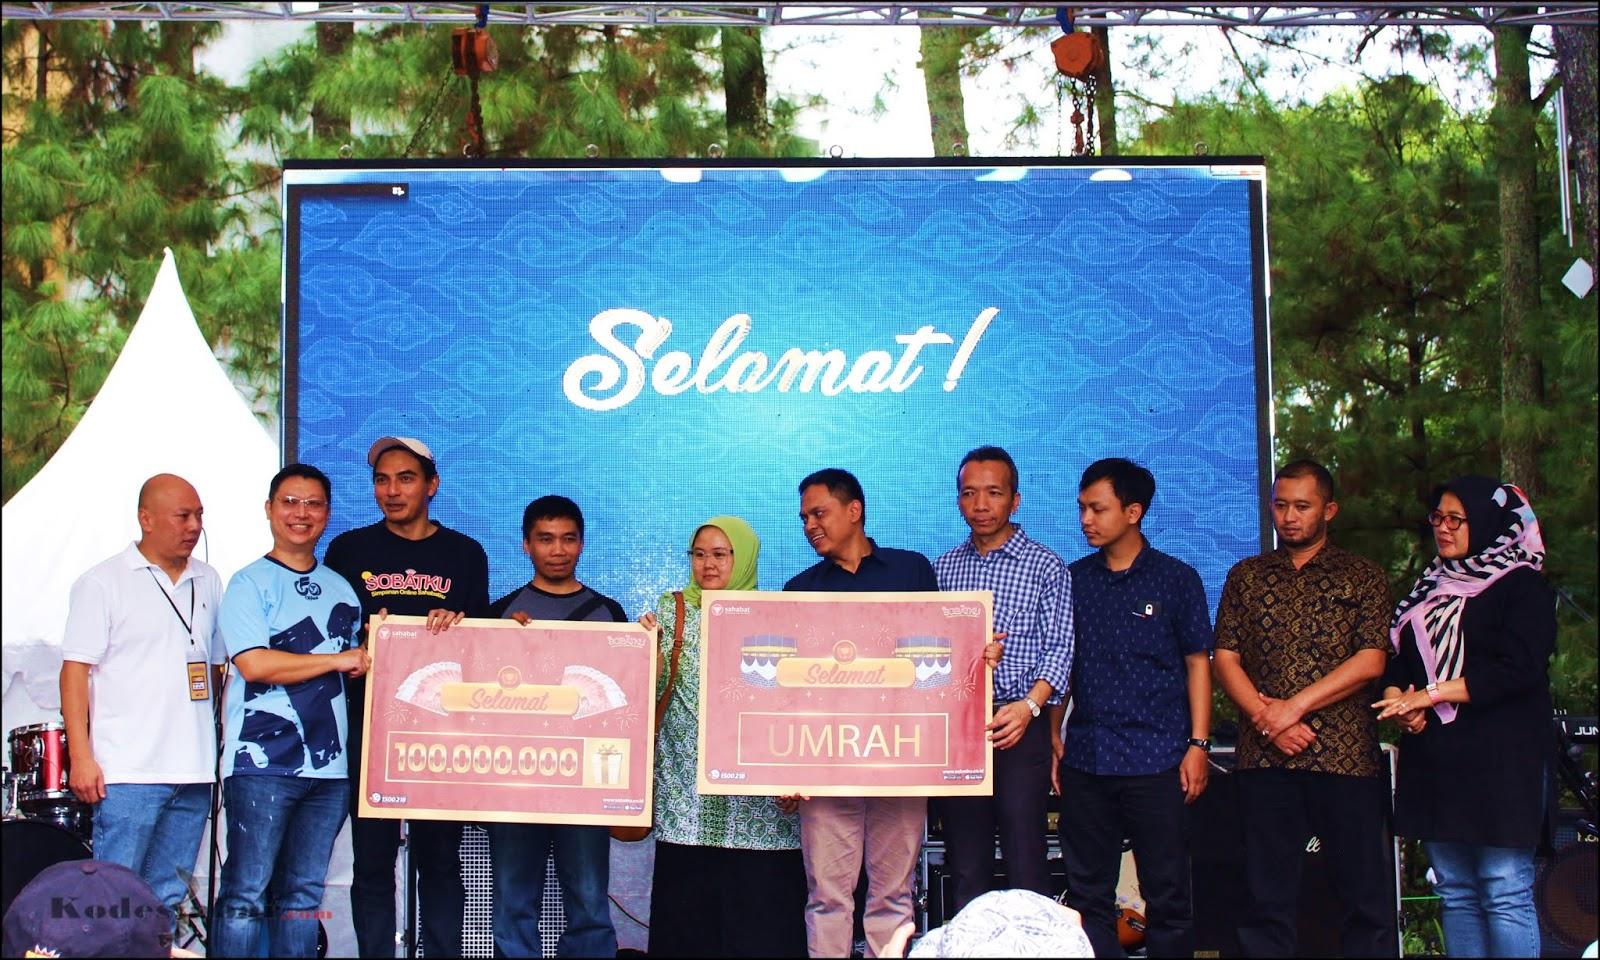 Pemenang Undian Grand Prize Sobatku di Bandung